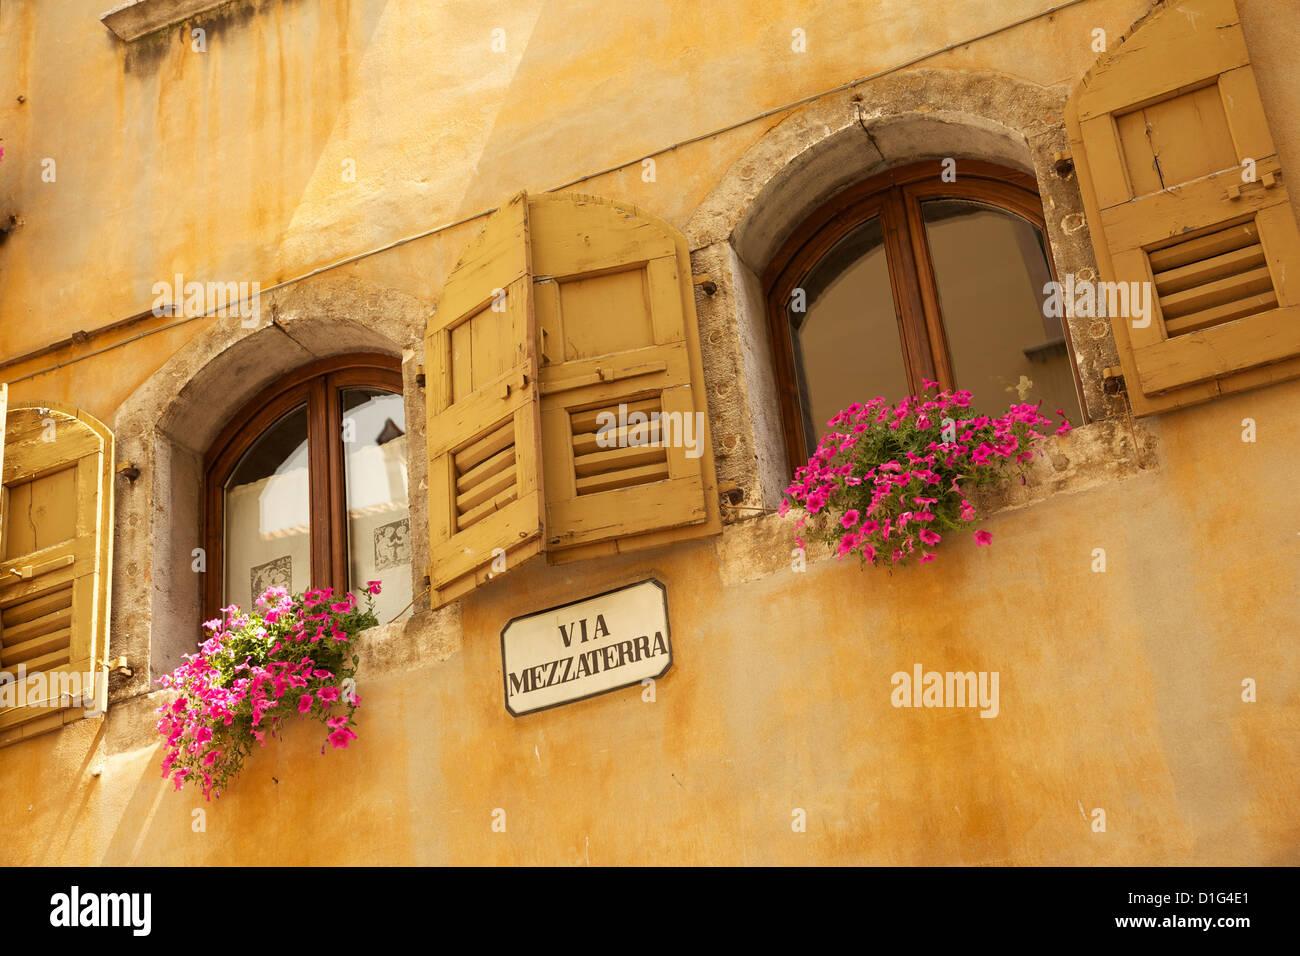 Shuttered windows and flowers, Piazza Mercato, Belluno, Province of Belluno, Veneto, Italy, Europe - Stock Image